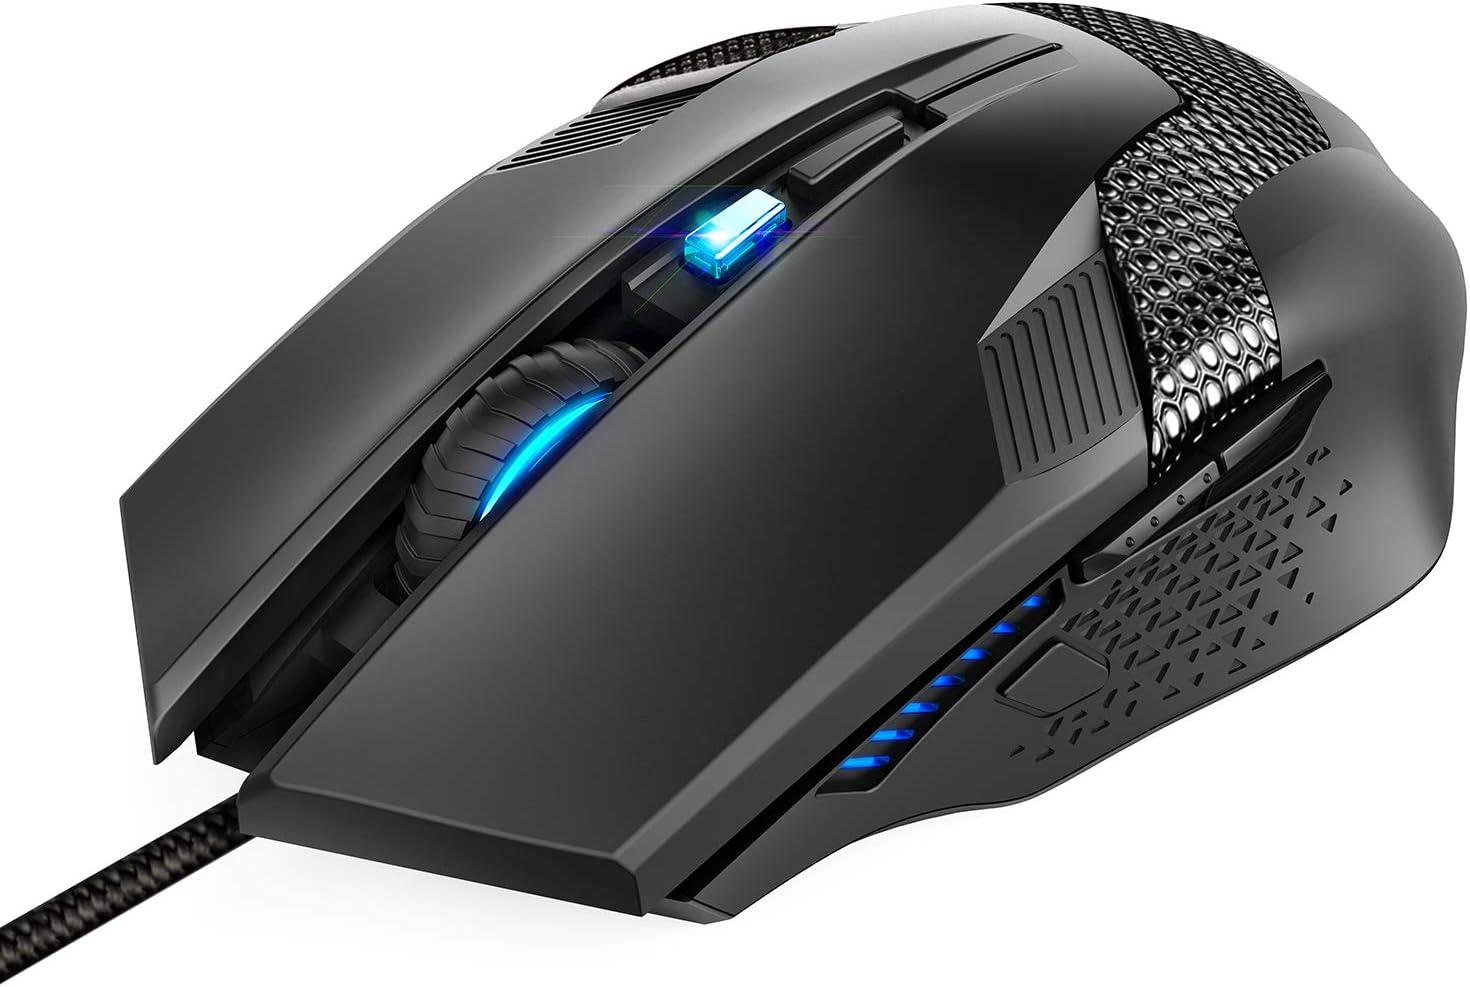 amazon com tecknet wired gaming mouse ergonomic optical usb gaming